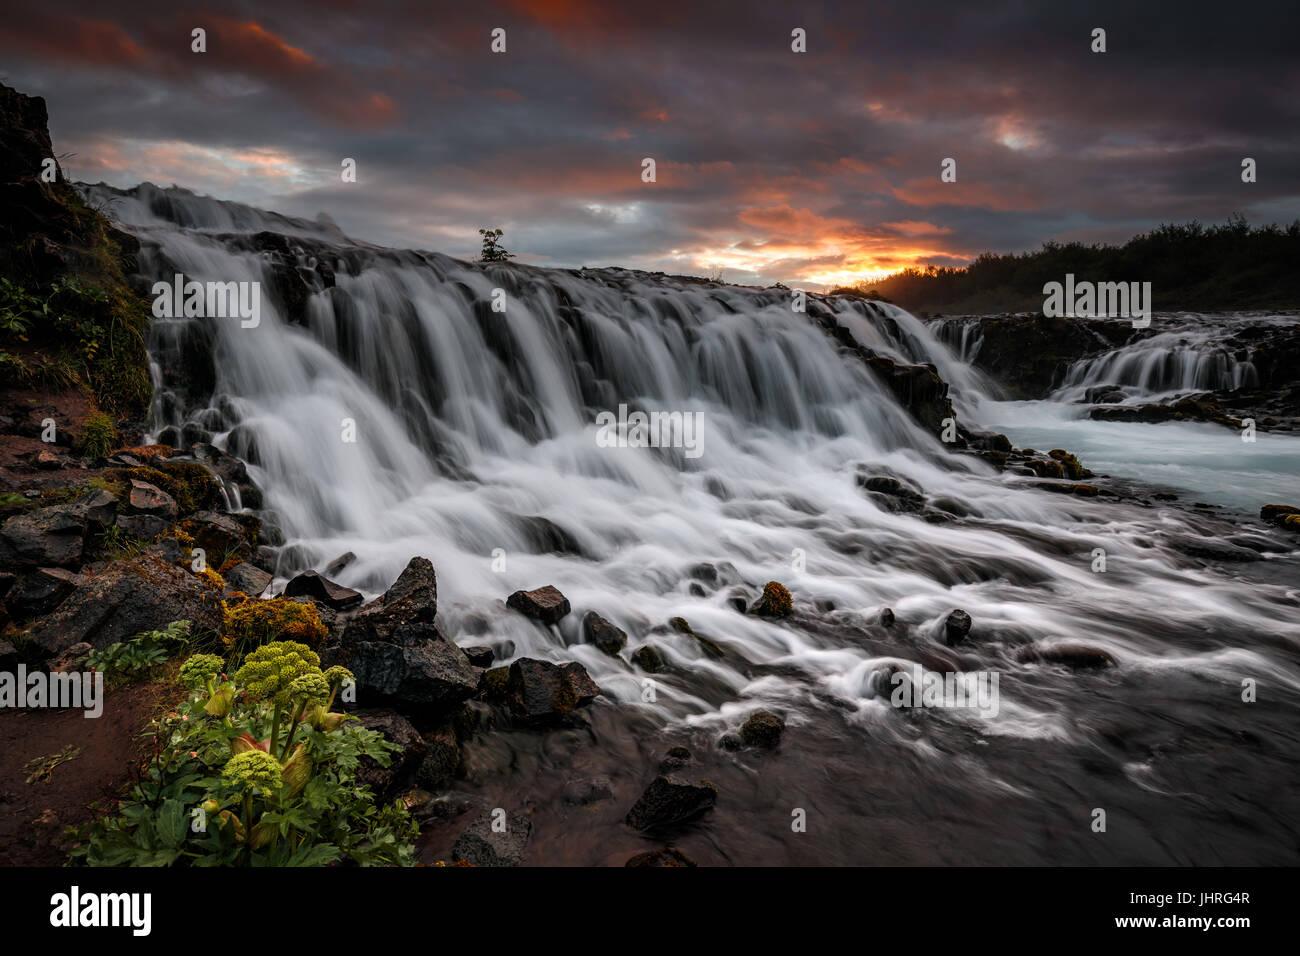 Bruarfoss in Iceland - Stock Image